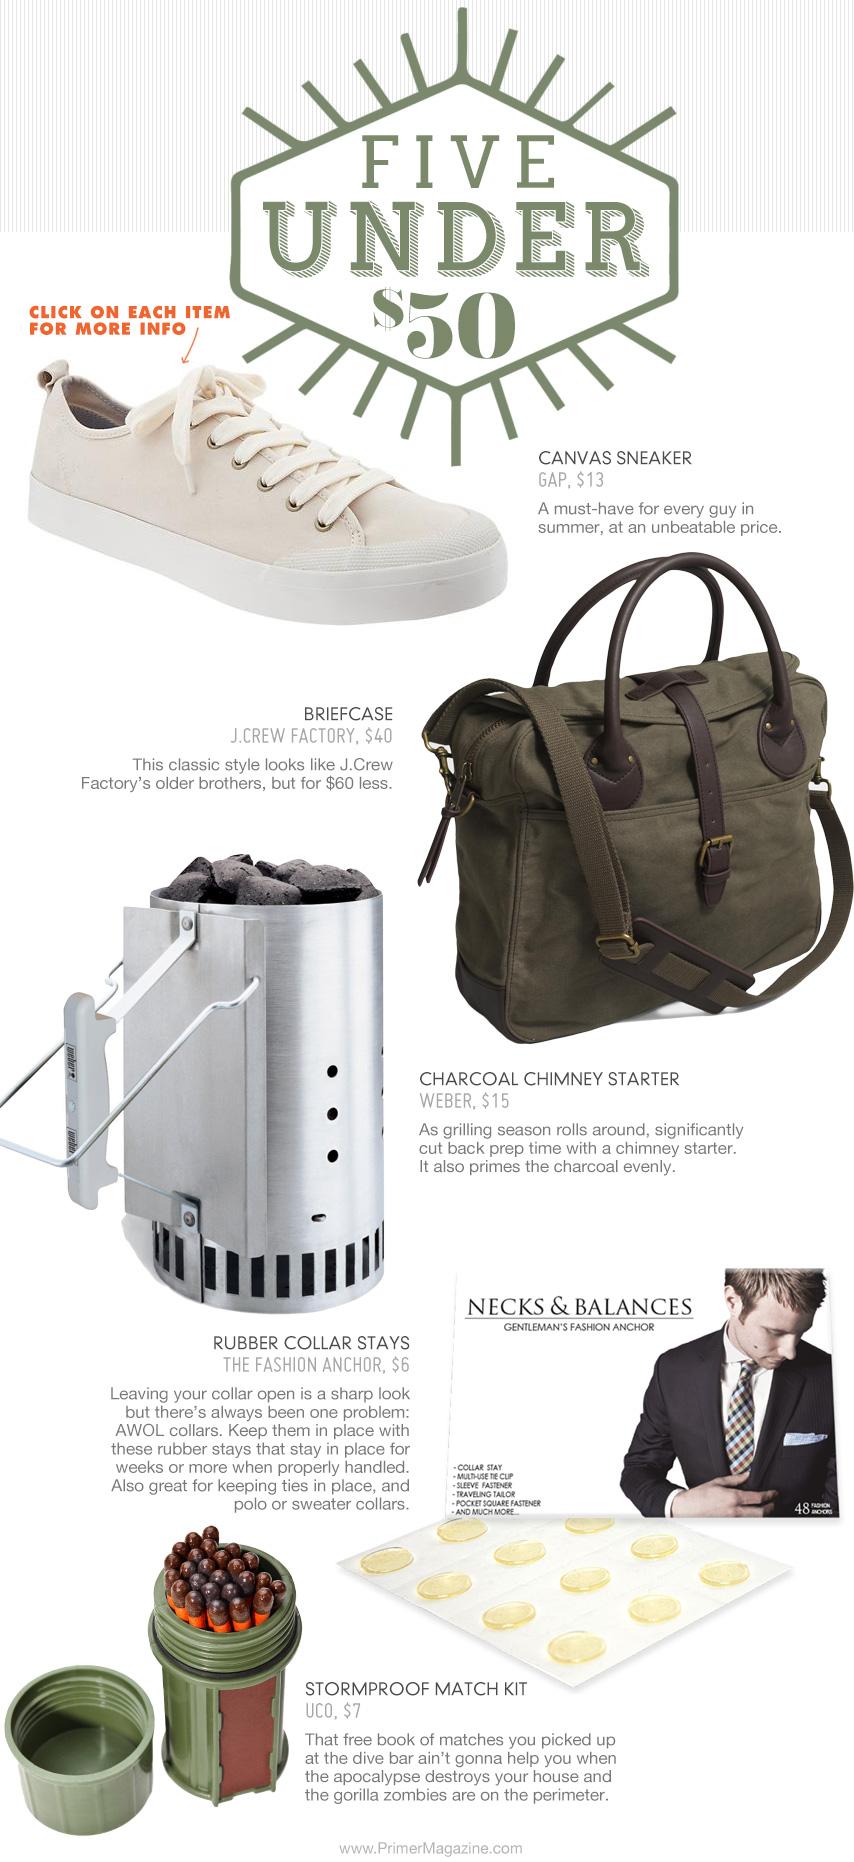 5 under 50 - sneakers, briefcase, chimney starter, necks and balances, matches